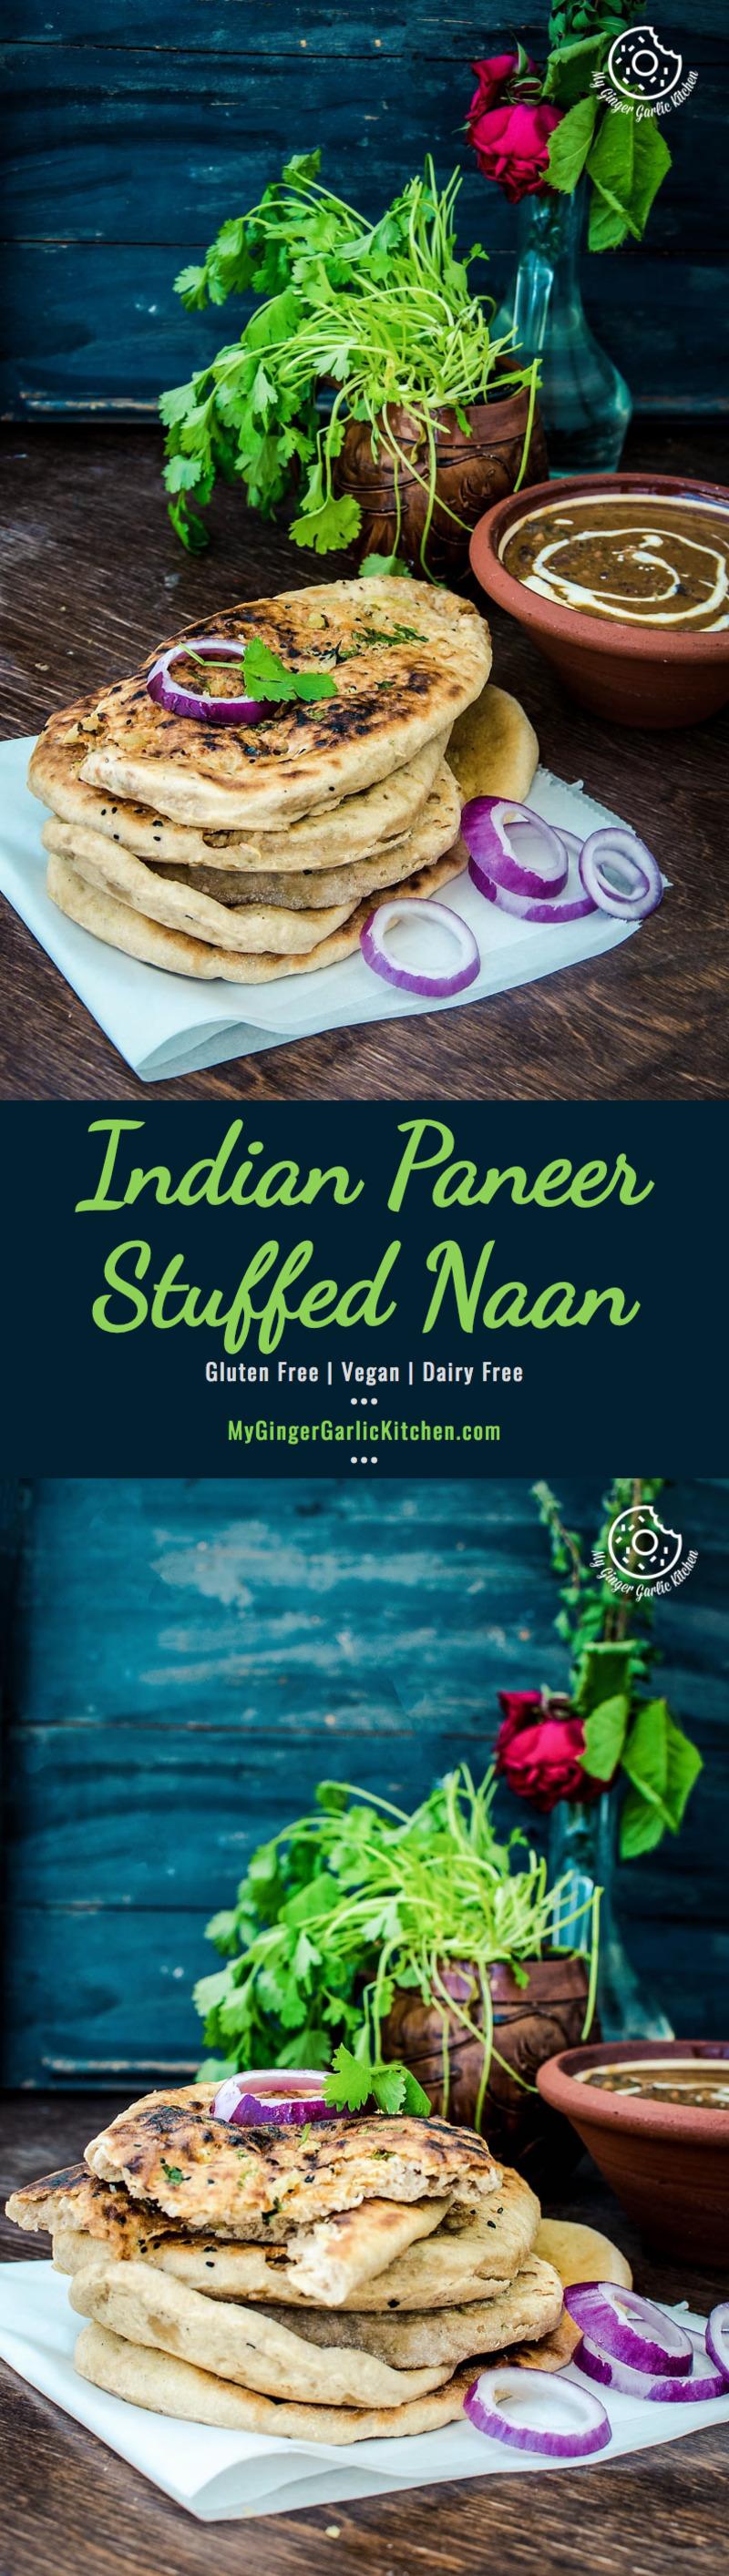 How To Make Indian Paneer Stuffed Naan   mygingergarlickitchen.com/ @anupama_dreams